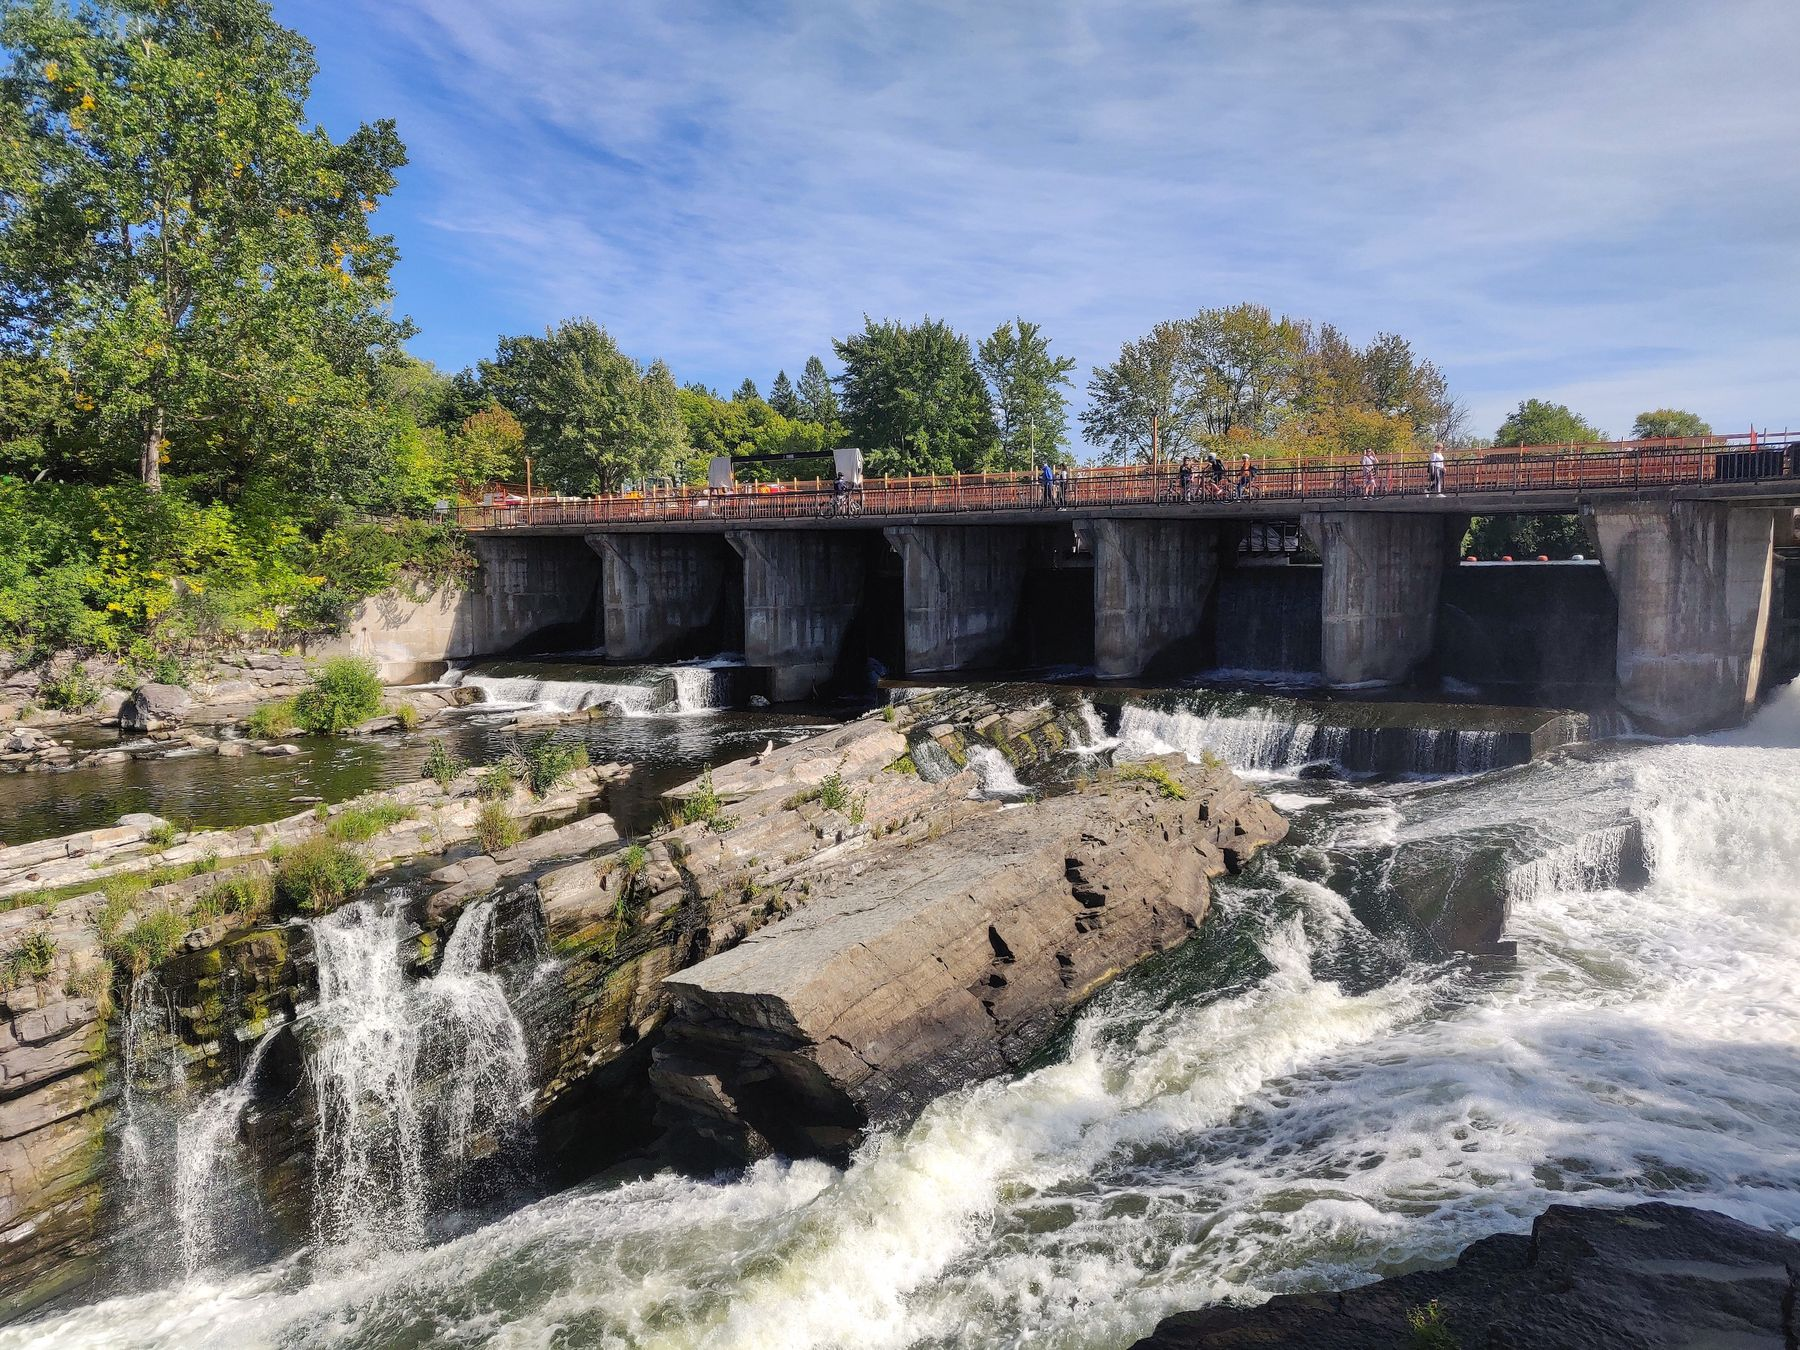 Gushing falls in Hog's Back Park, Ottawa